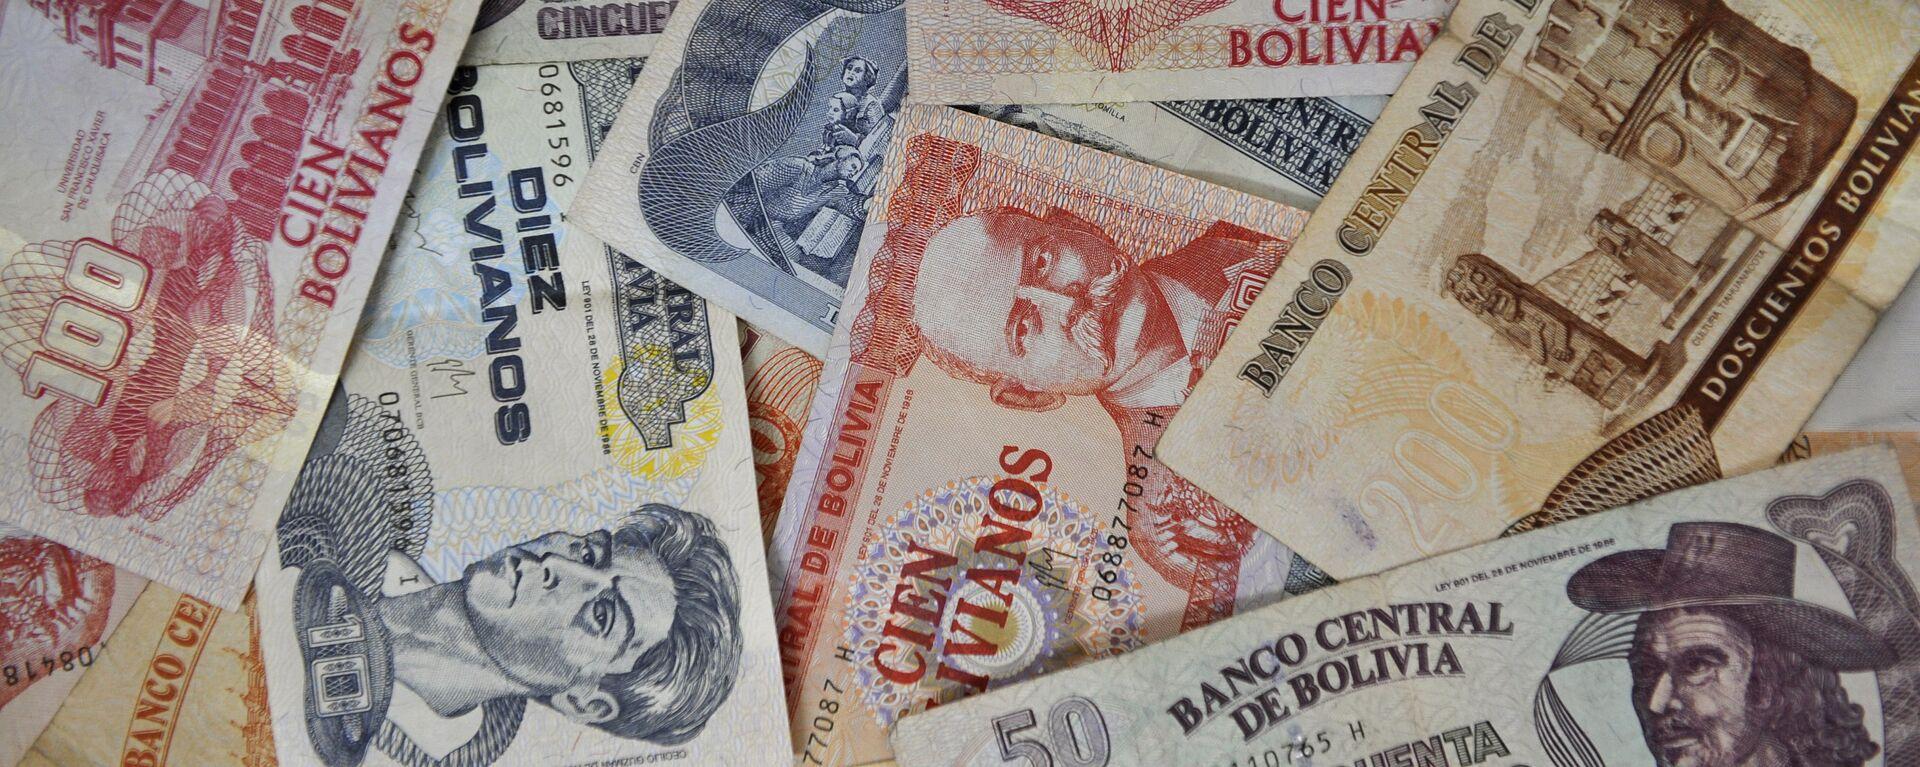 Bolivianos (billetes) - Sputnik Mundo, 1920, 26.05.2021